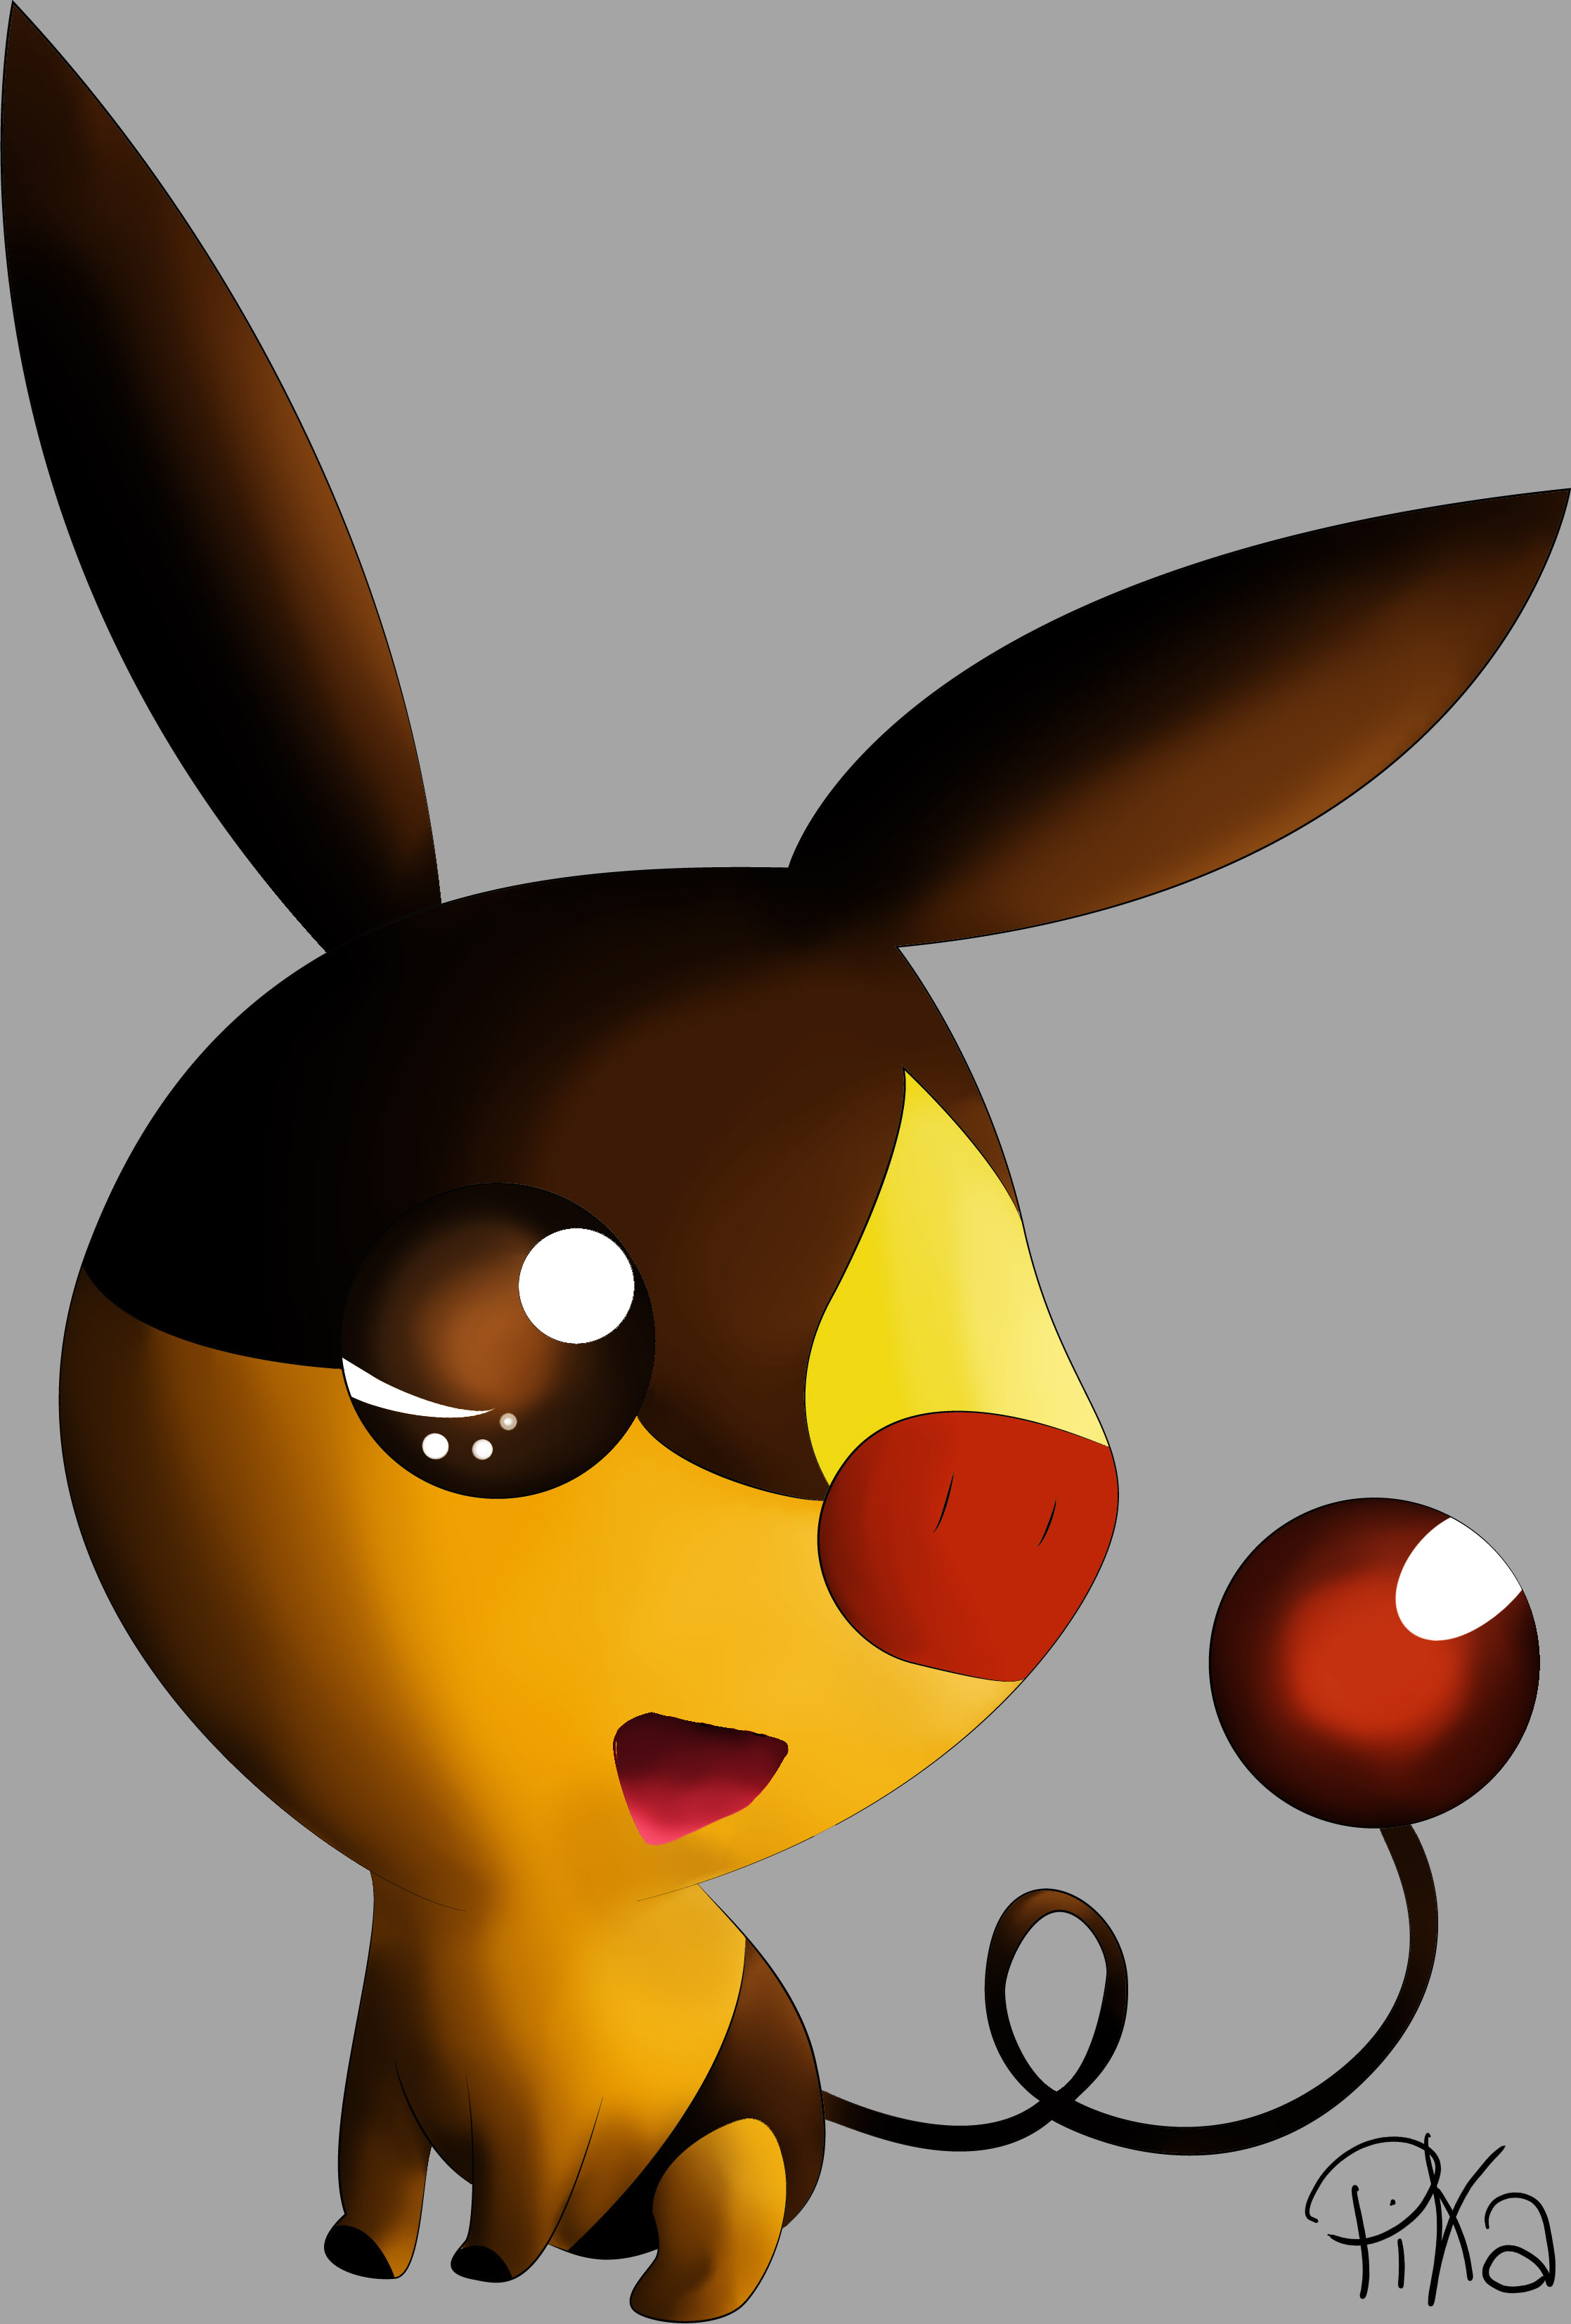 Dessin Gruikui de Pikachette59